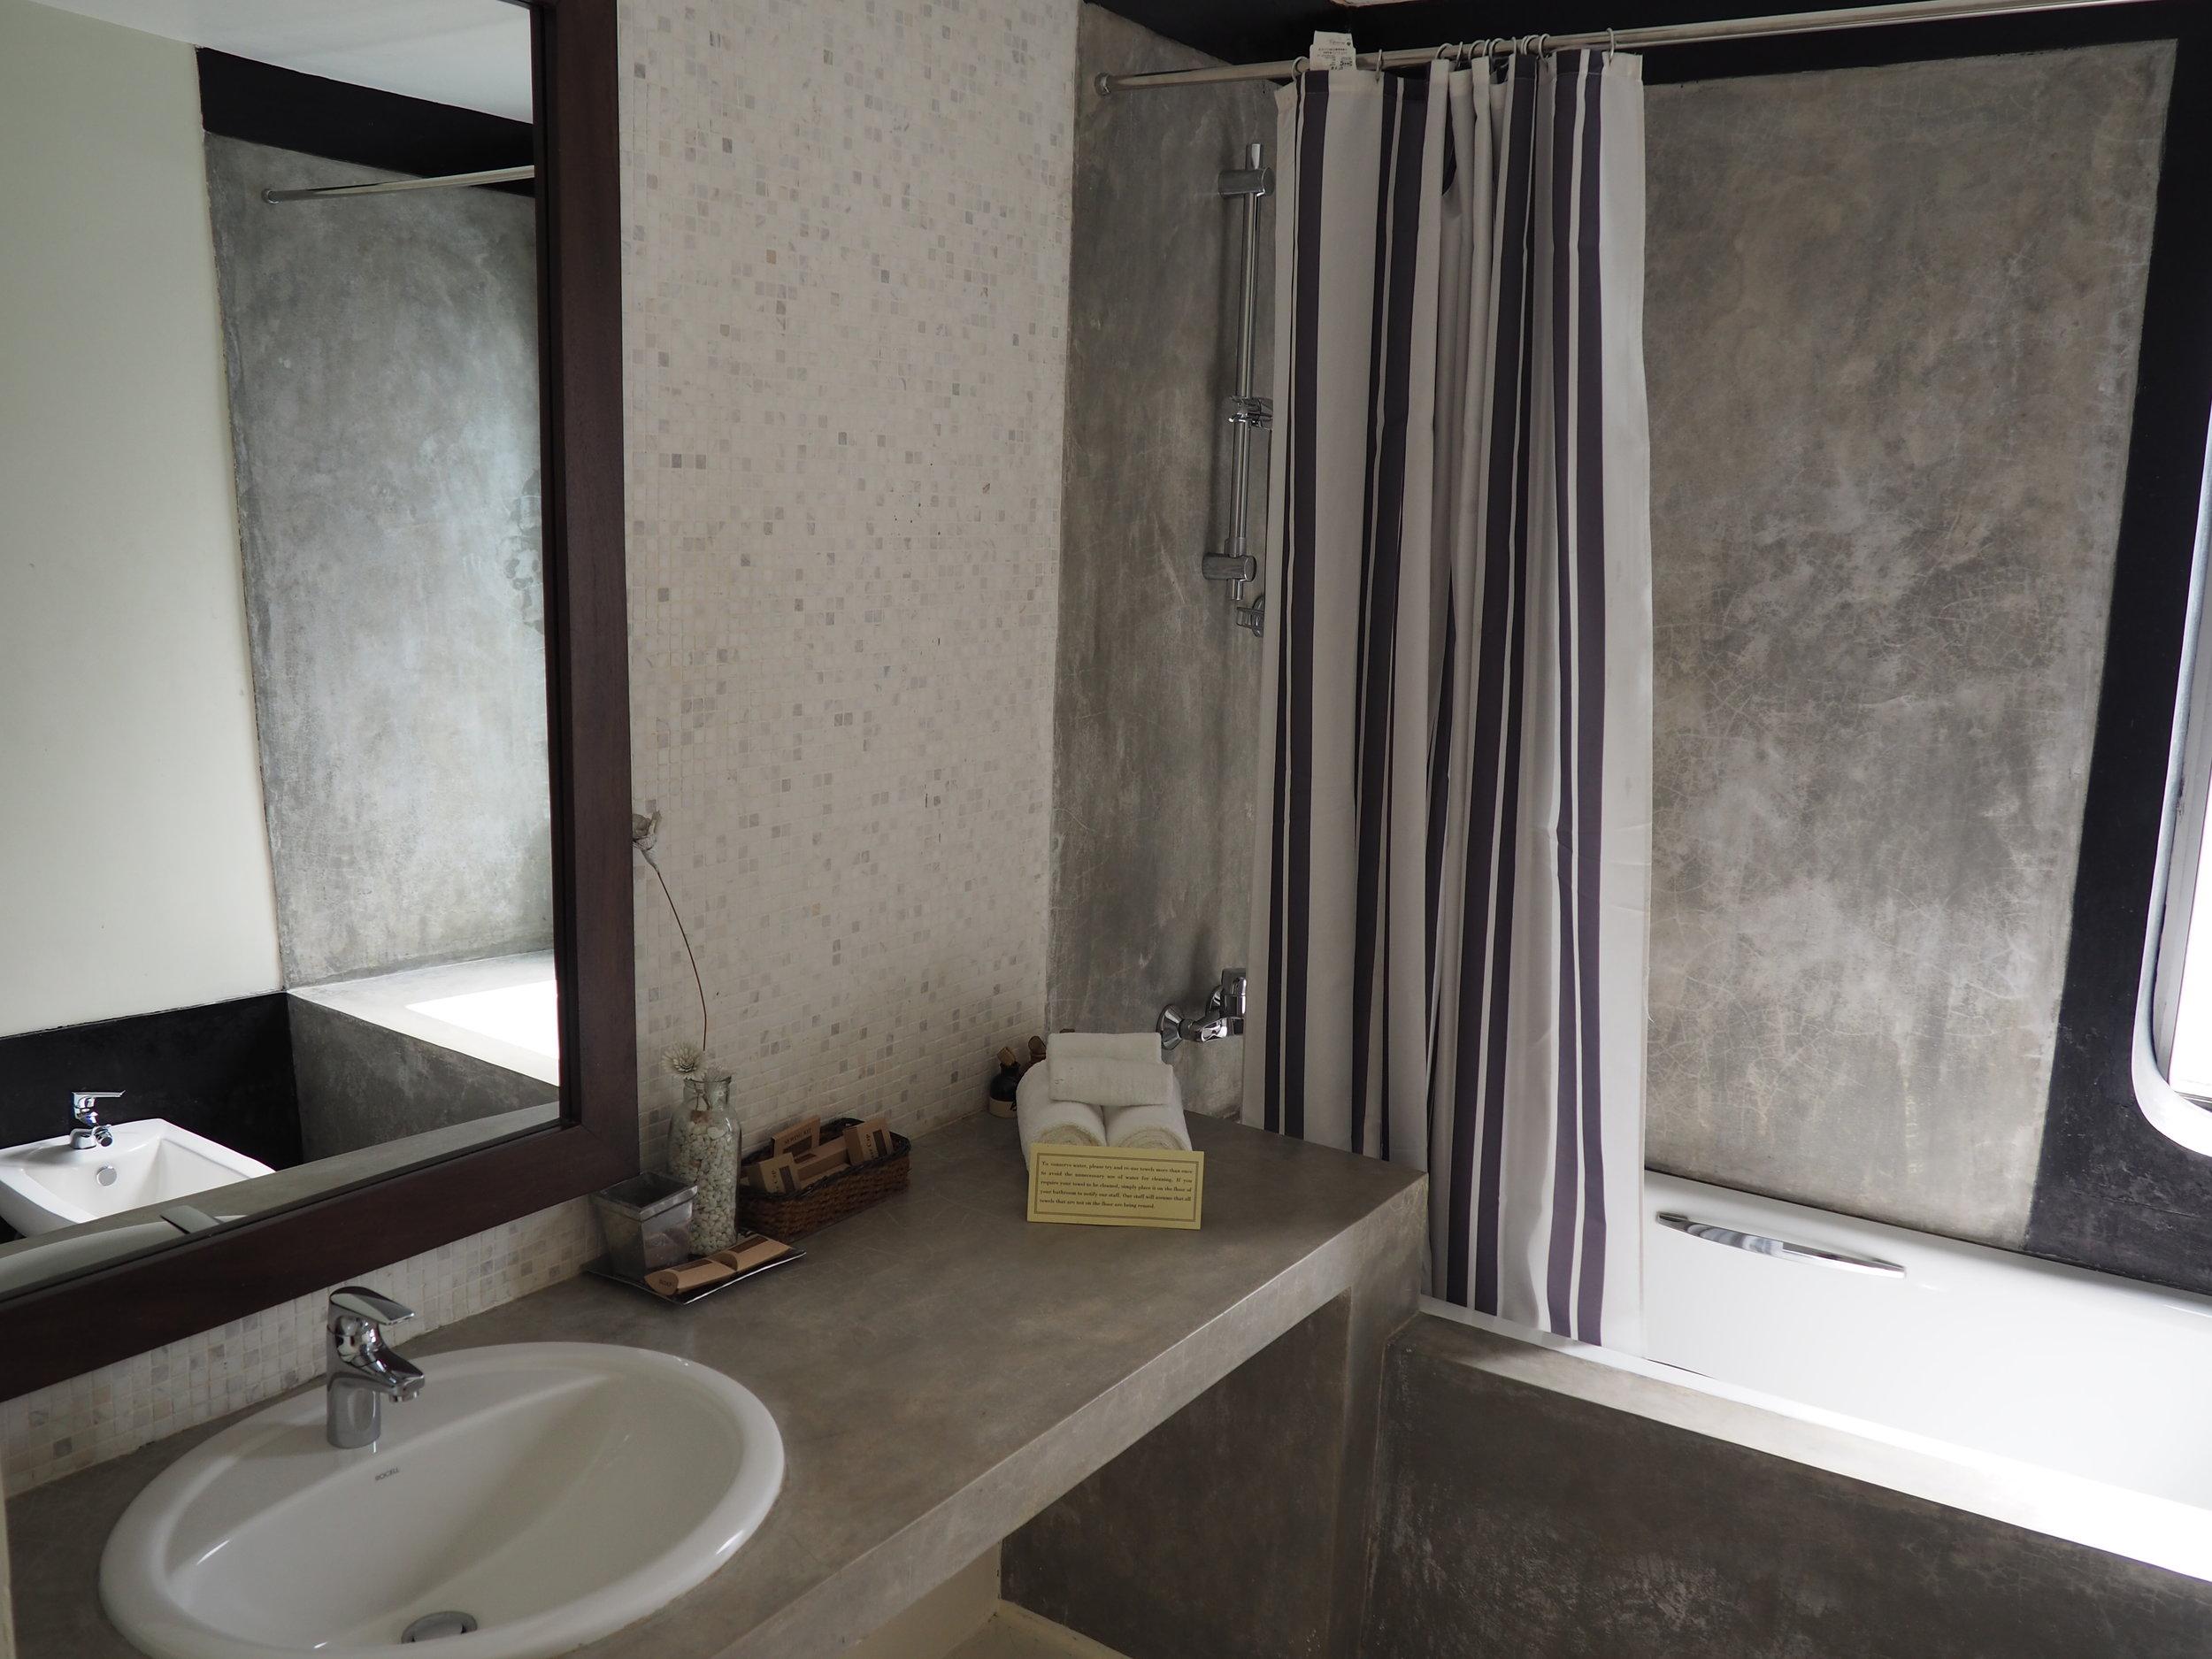 ceilao bath room.JPG